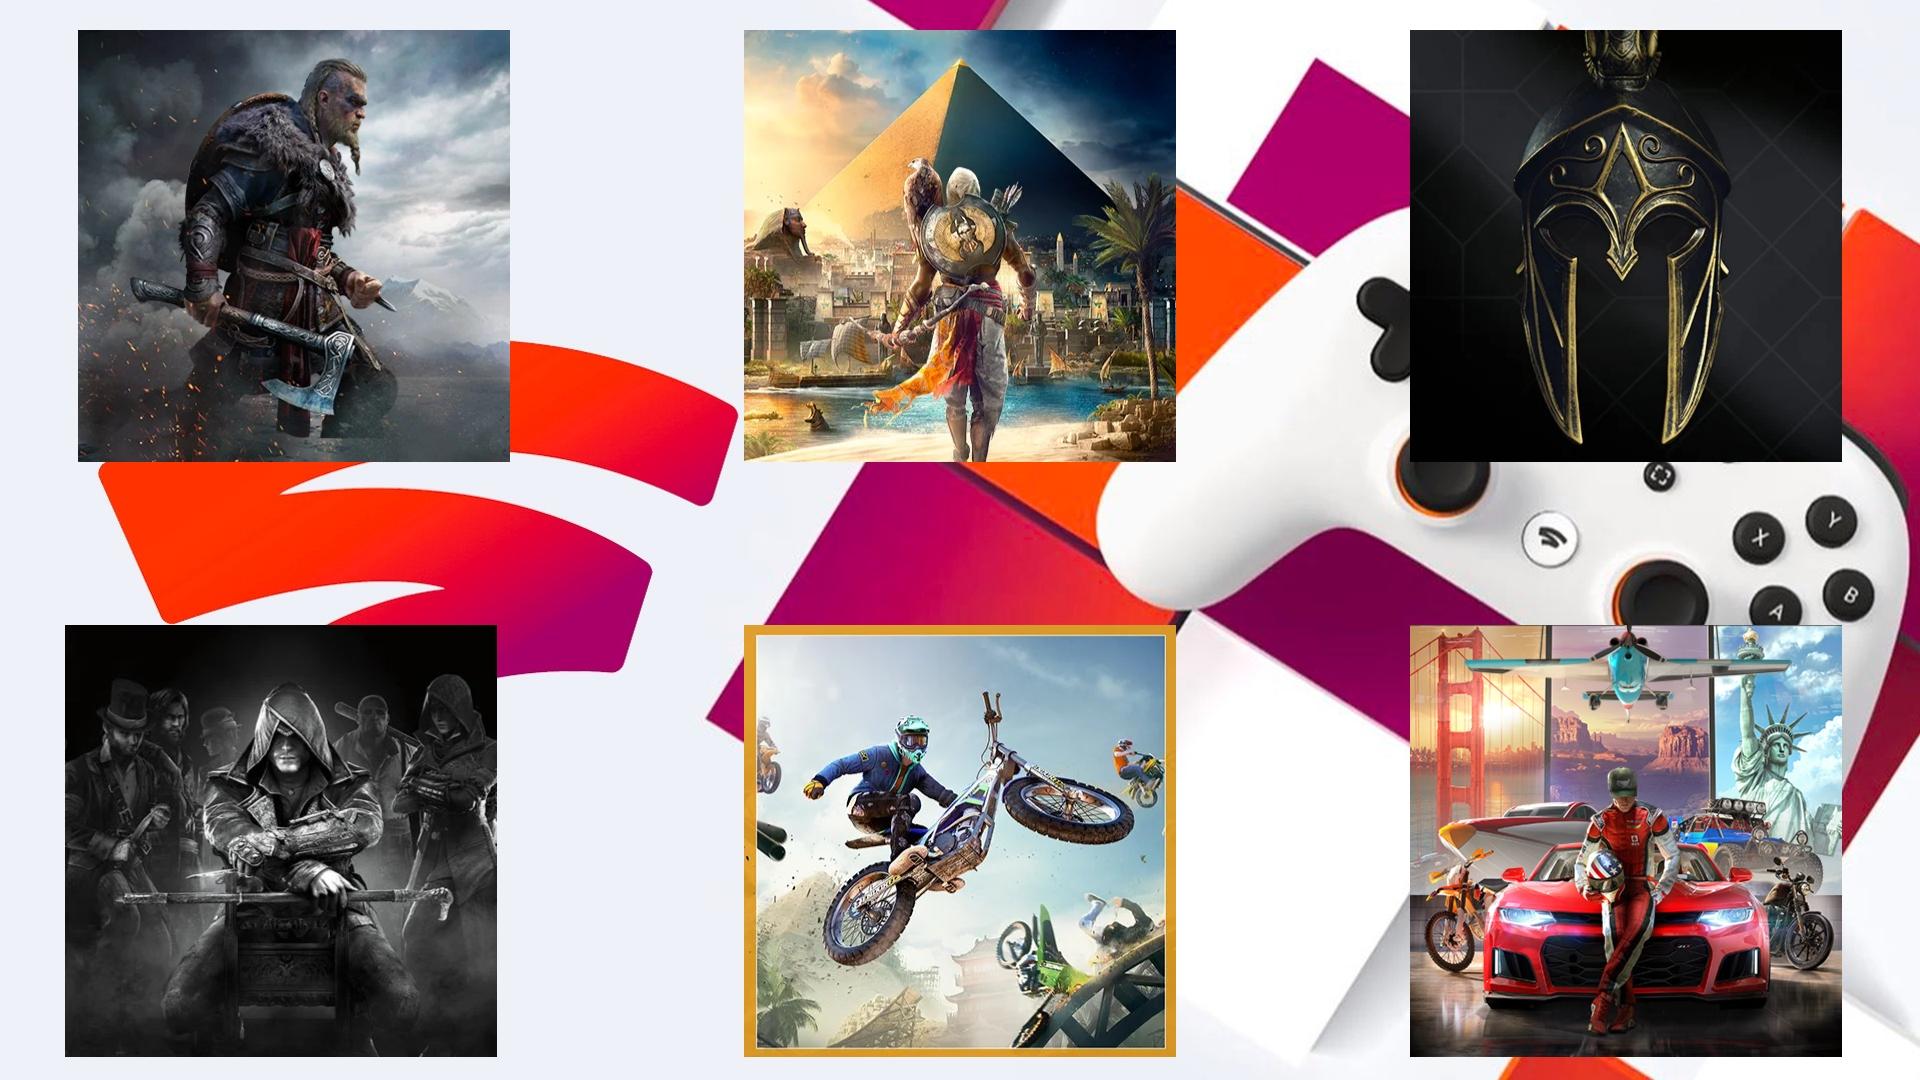 [Stadia] Ubisoft Sale u.a mit Assassin's Creed Valhalla, The Crew 2, Assassin's Creed Origins